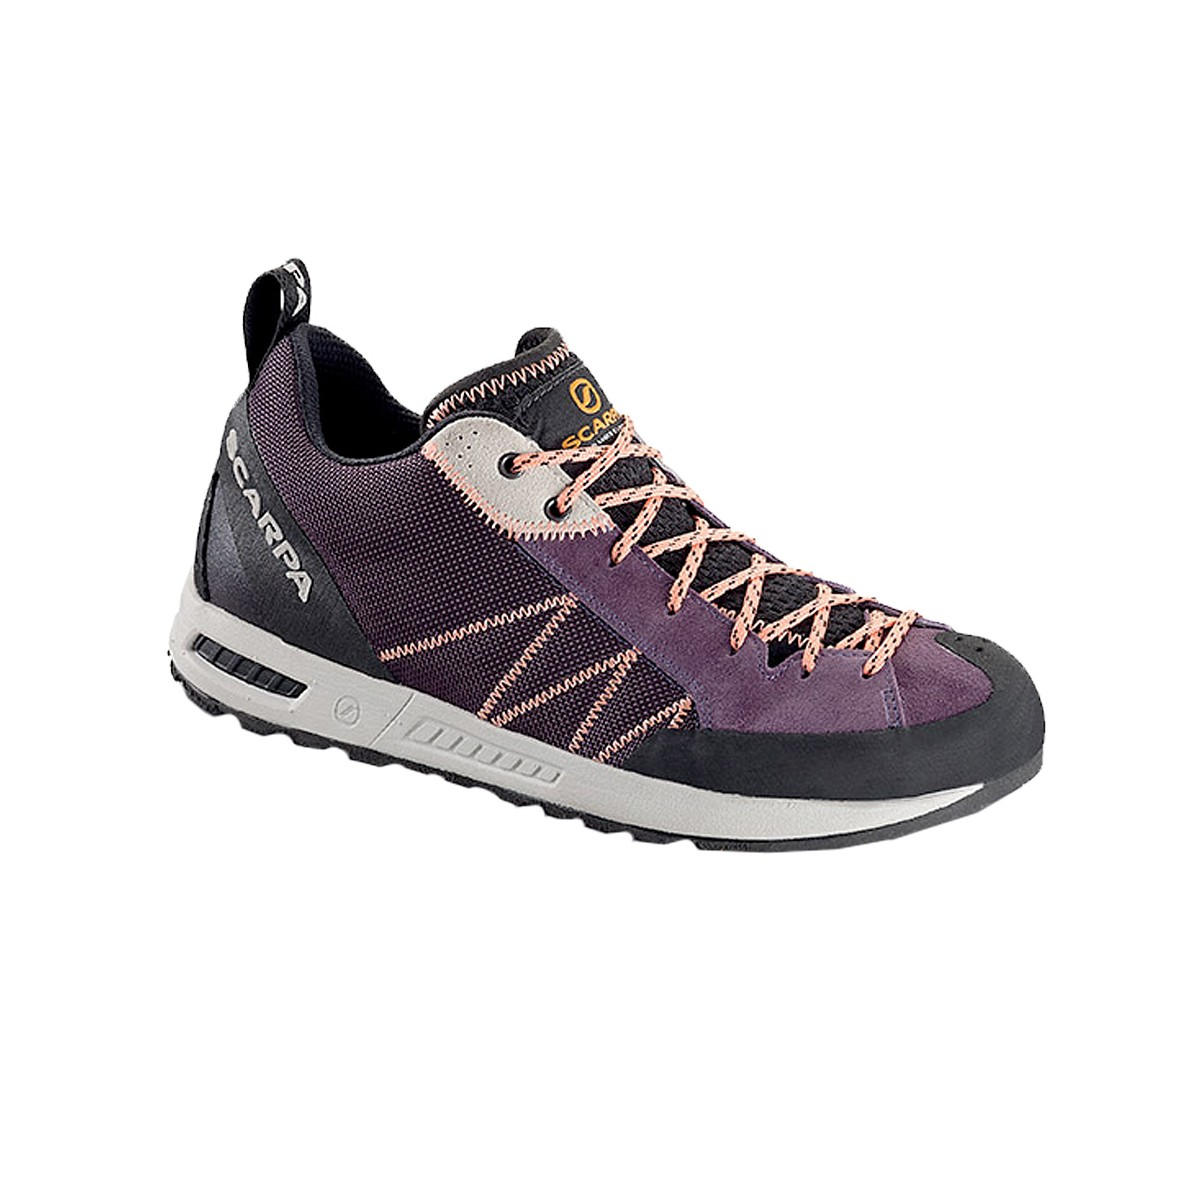 chaussures trekking scarpa gecko lite femme chaussure montagne. Black Bedroom Furniture Sets. Home Design Ideas